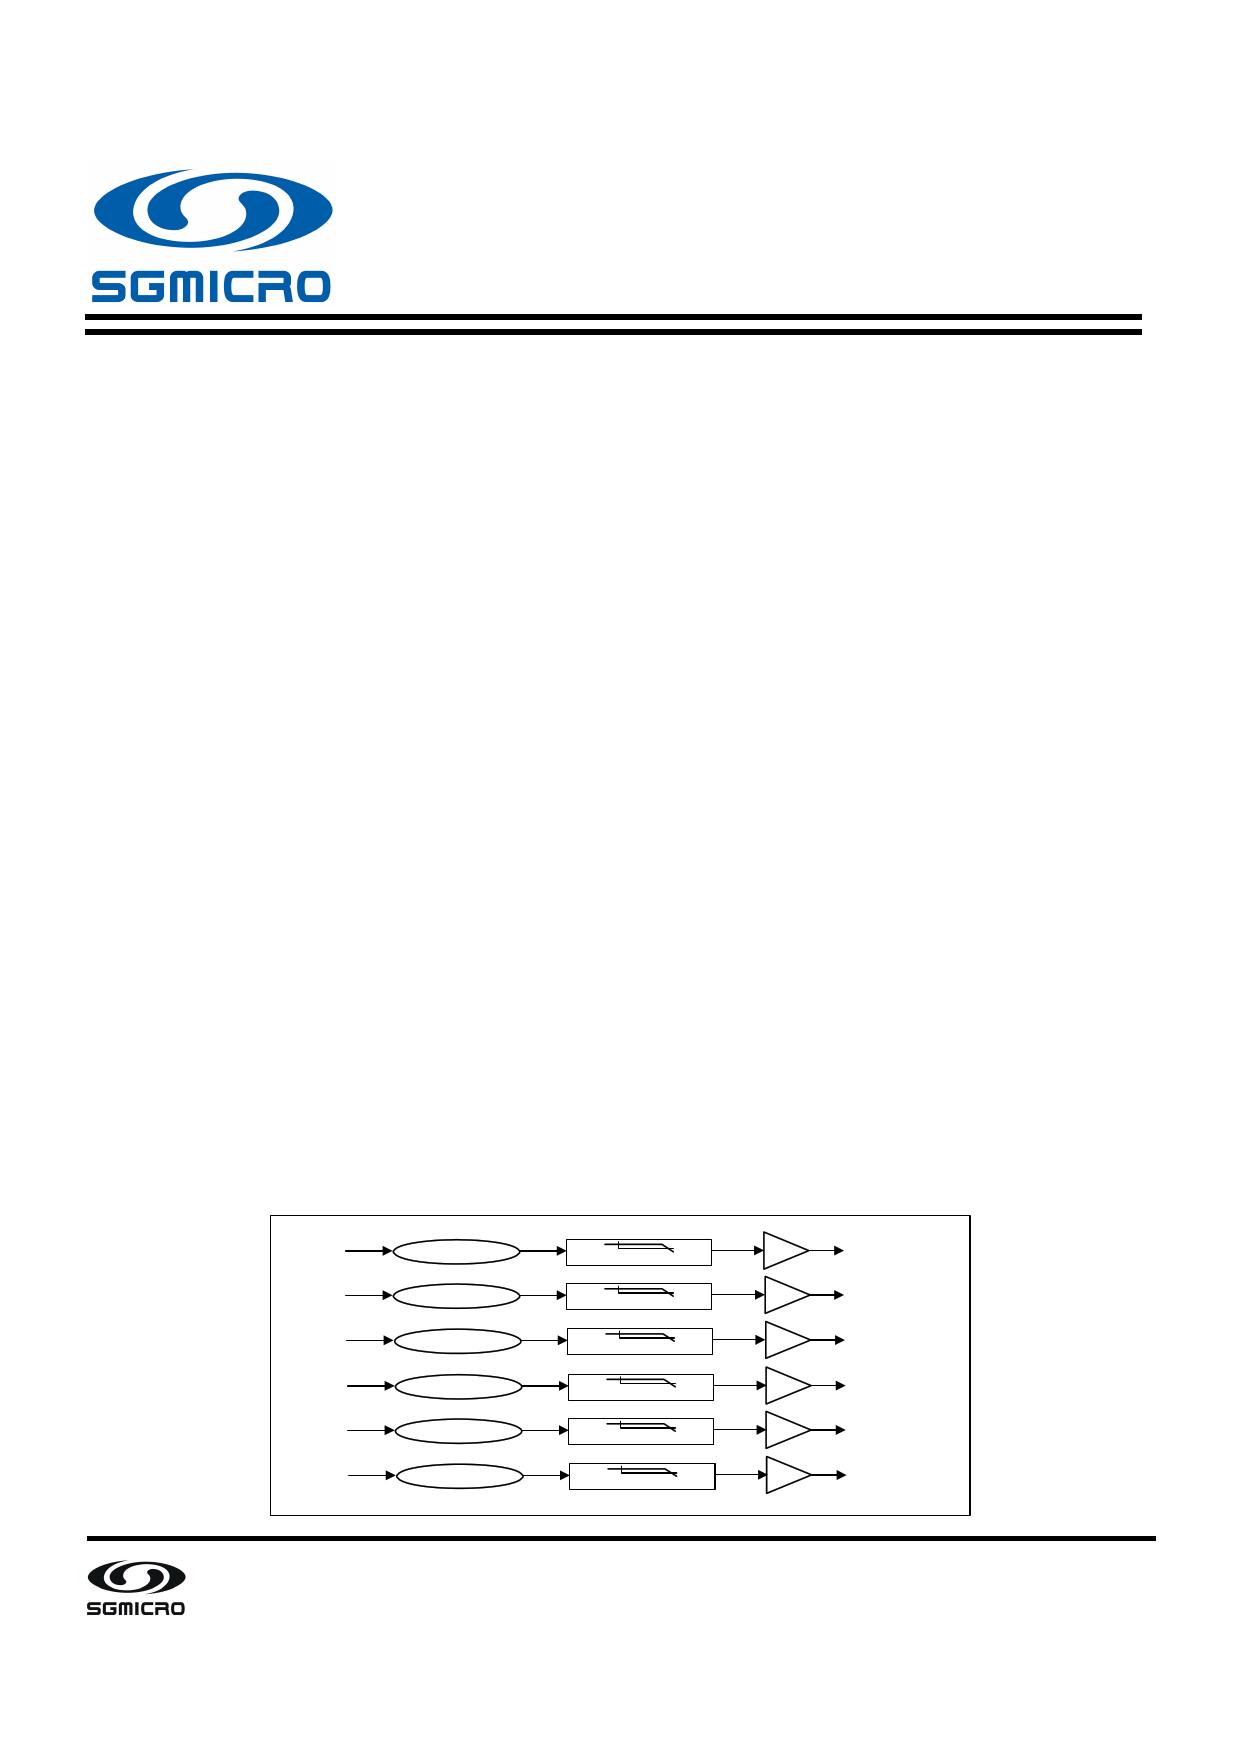 SGM9126 datasheet, circuit